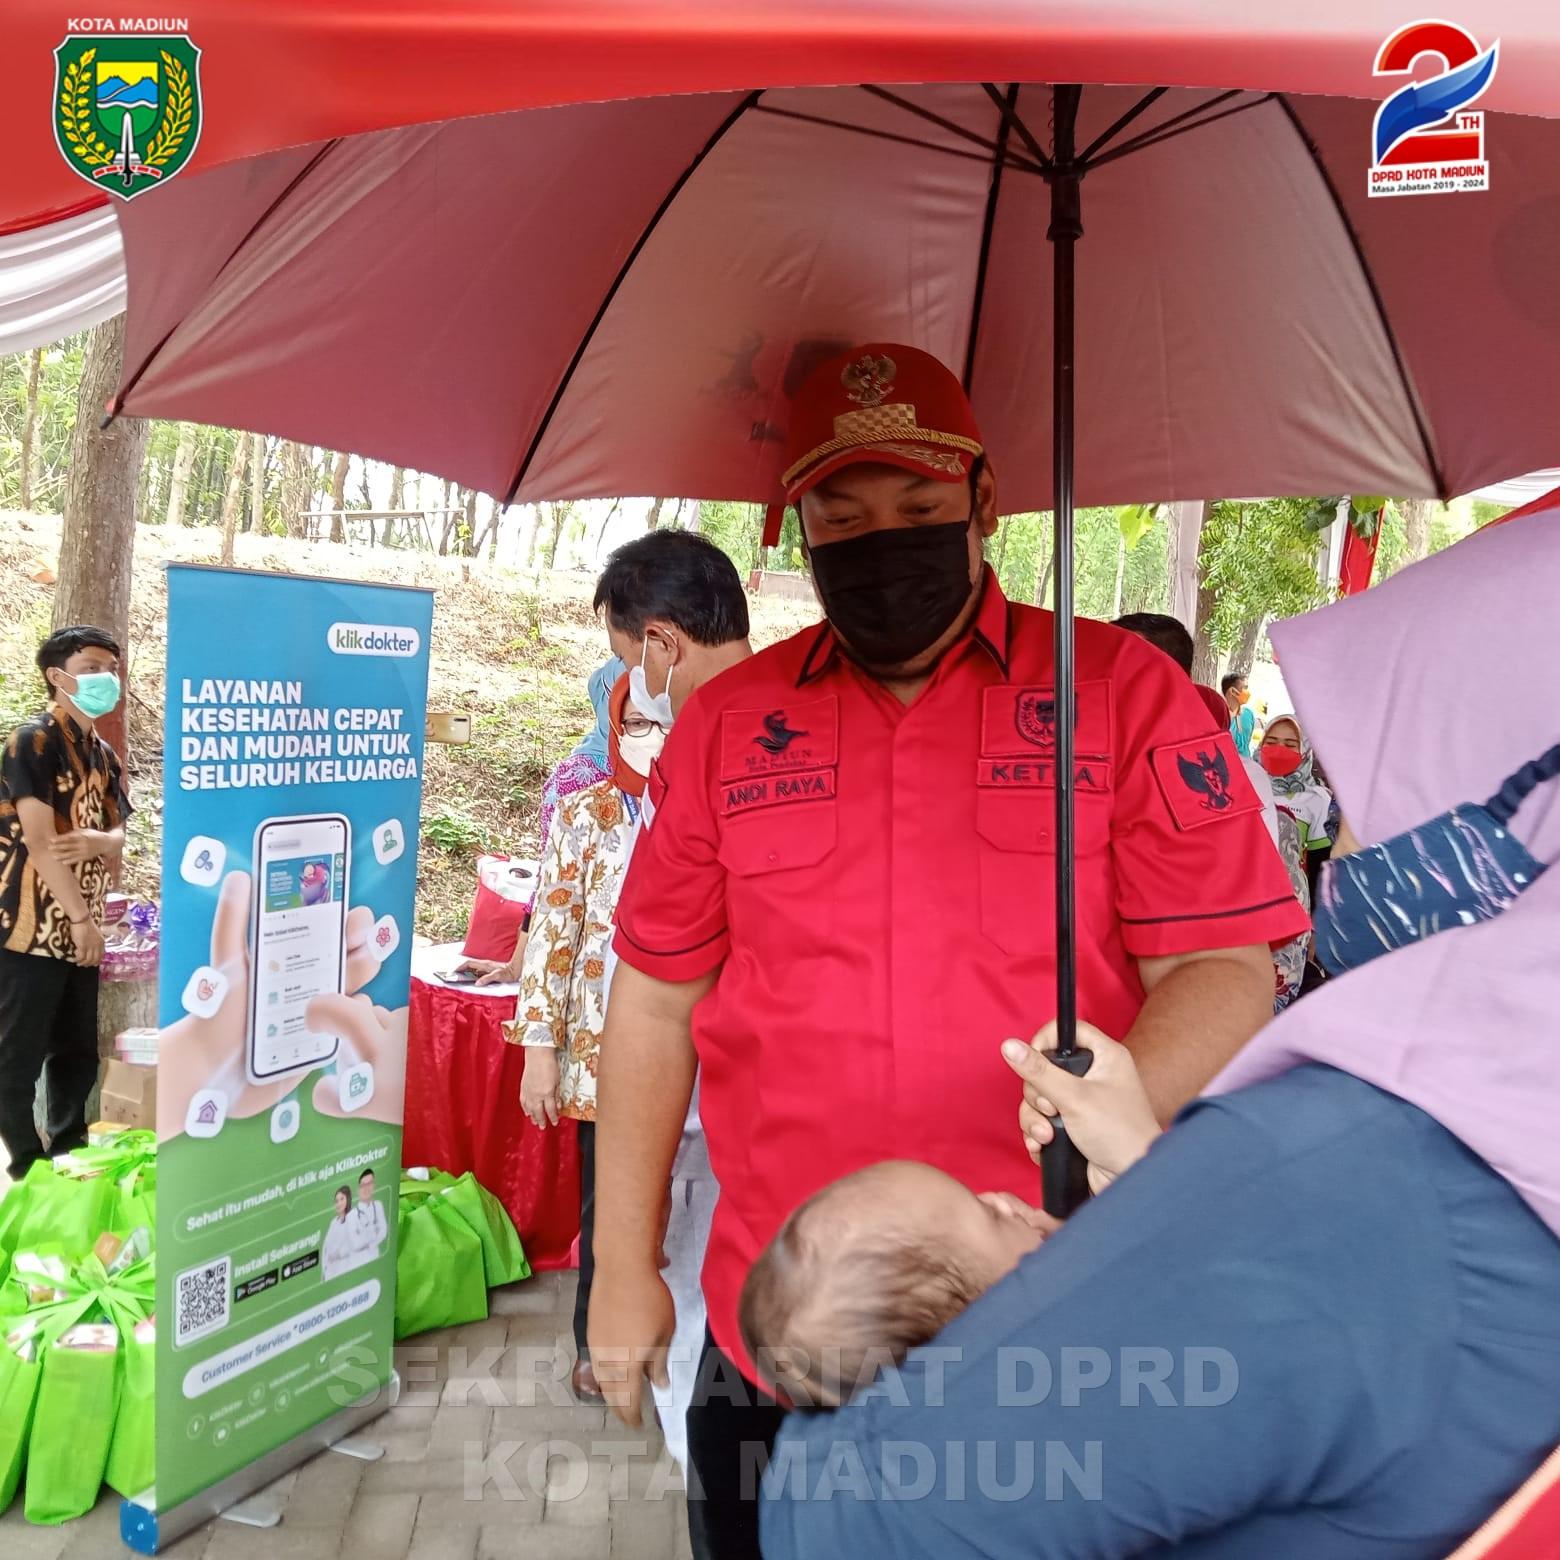 Pimpinan DPRD Kota Madiun Tinjau Pilot Project Program Penurunan Stunting